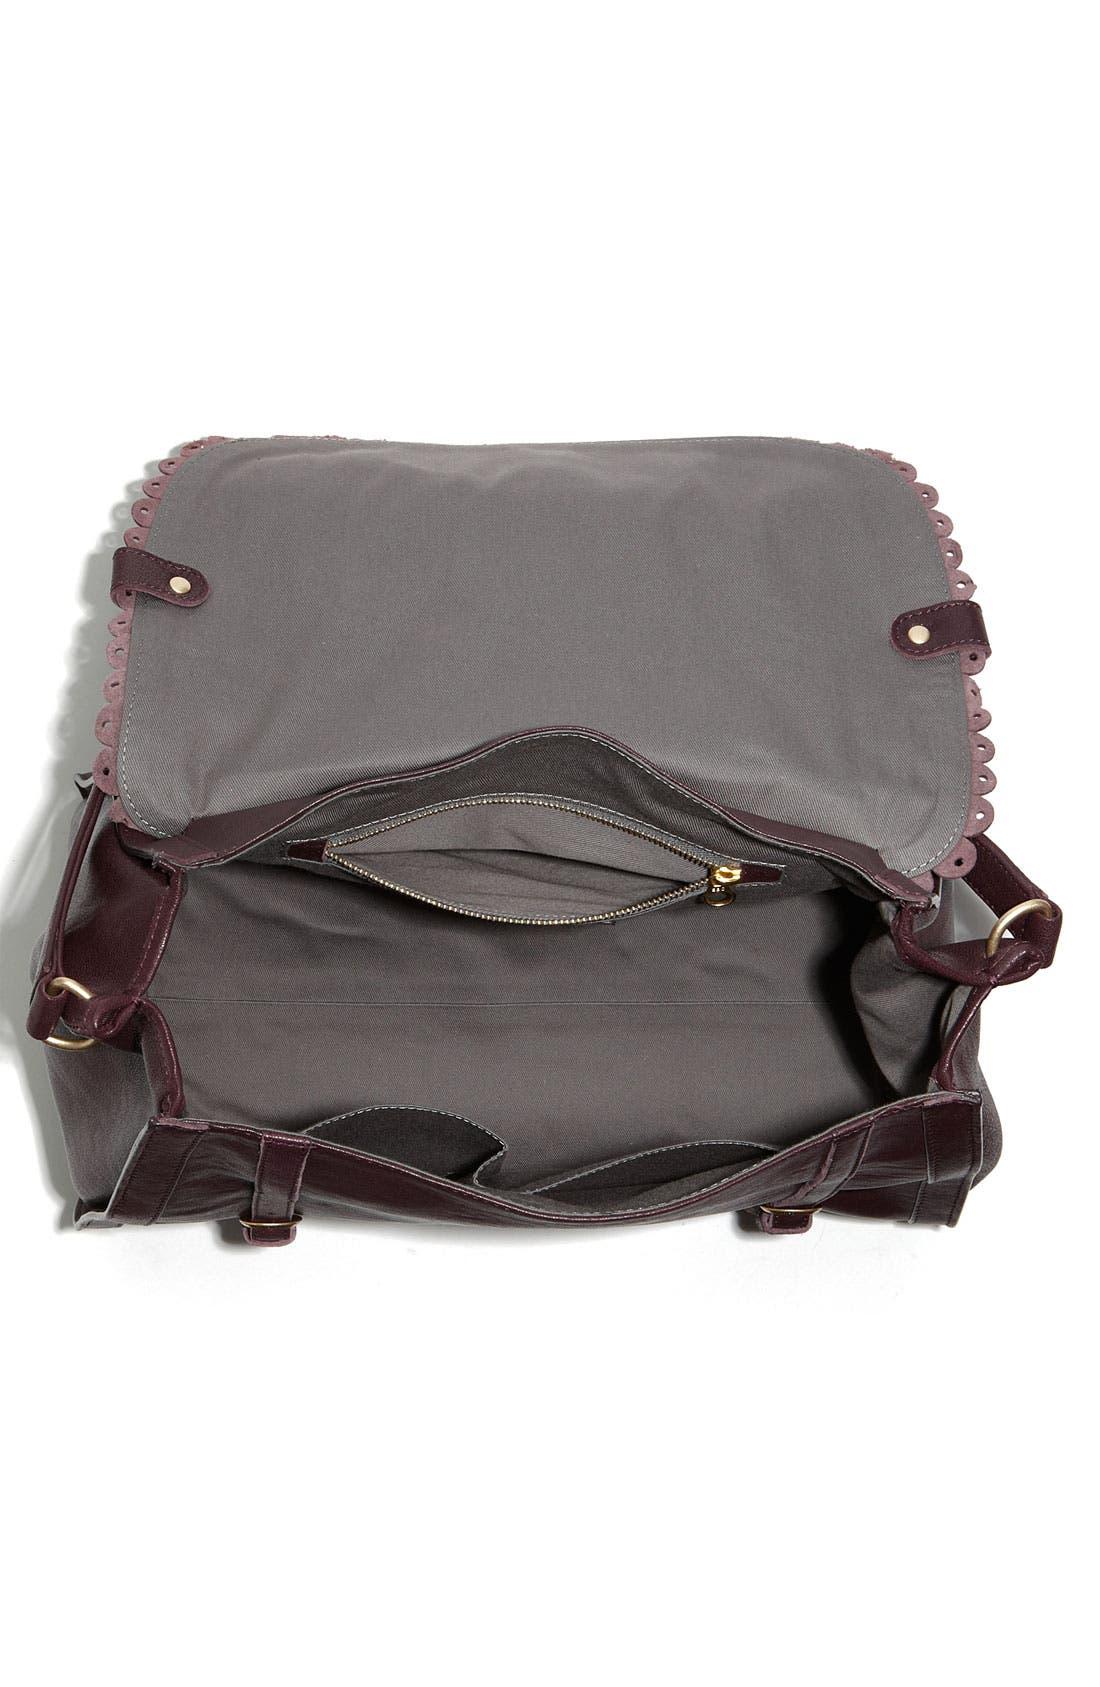 Alternate Image 3  - See By Chloé 'Poya Vintage - Large' Leather Satchel